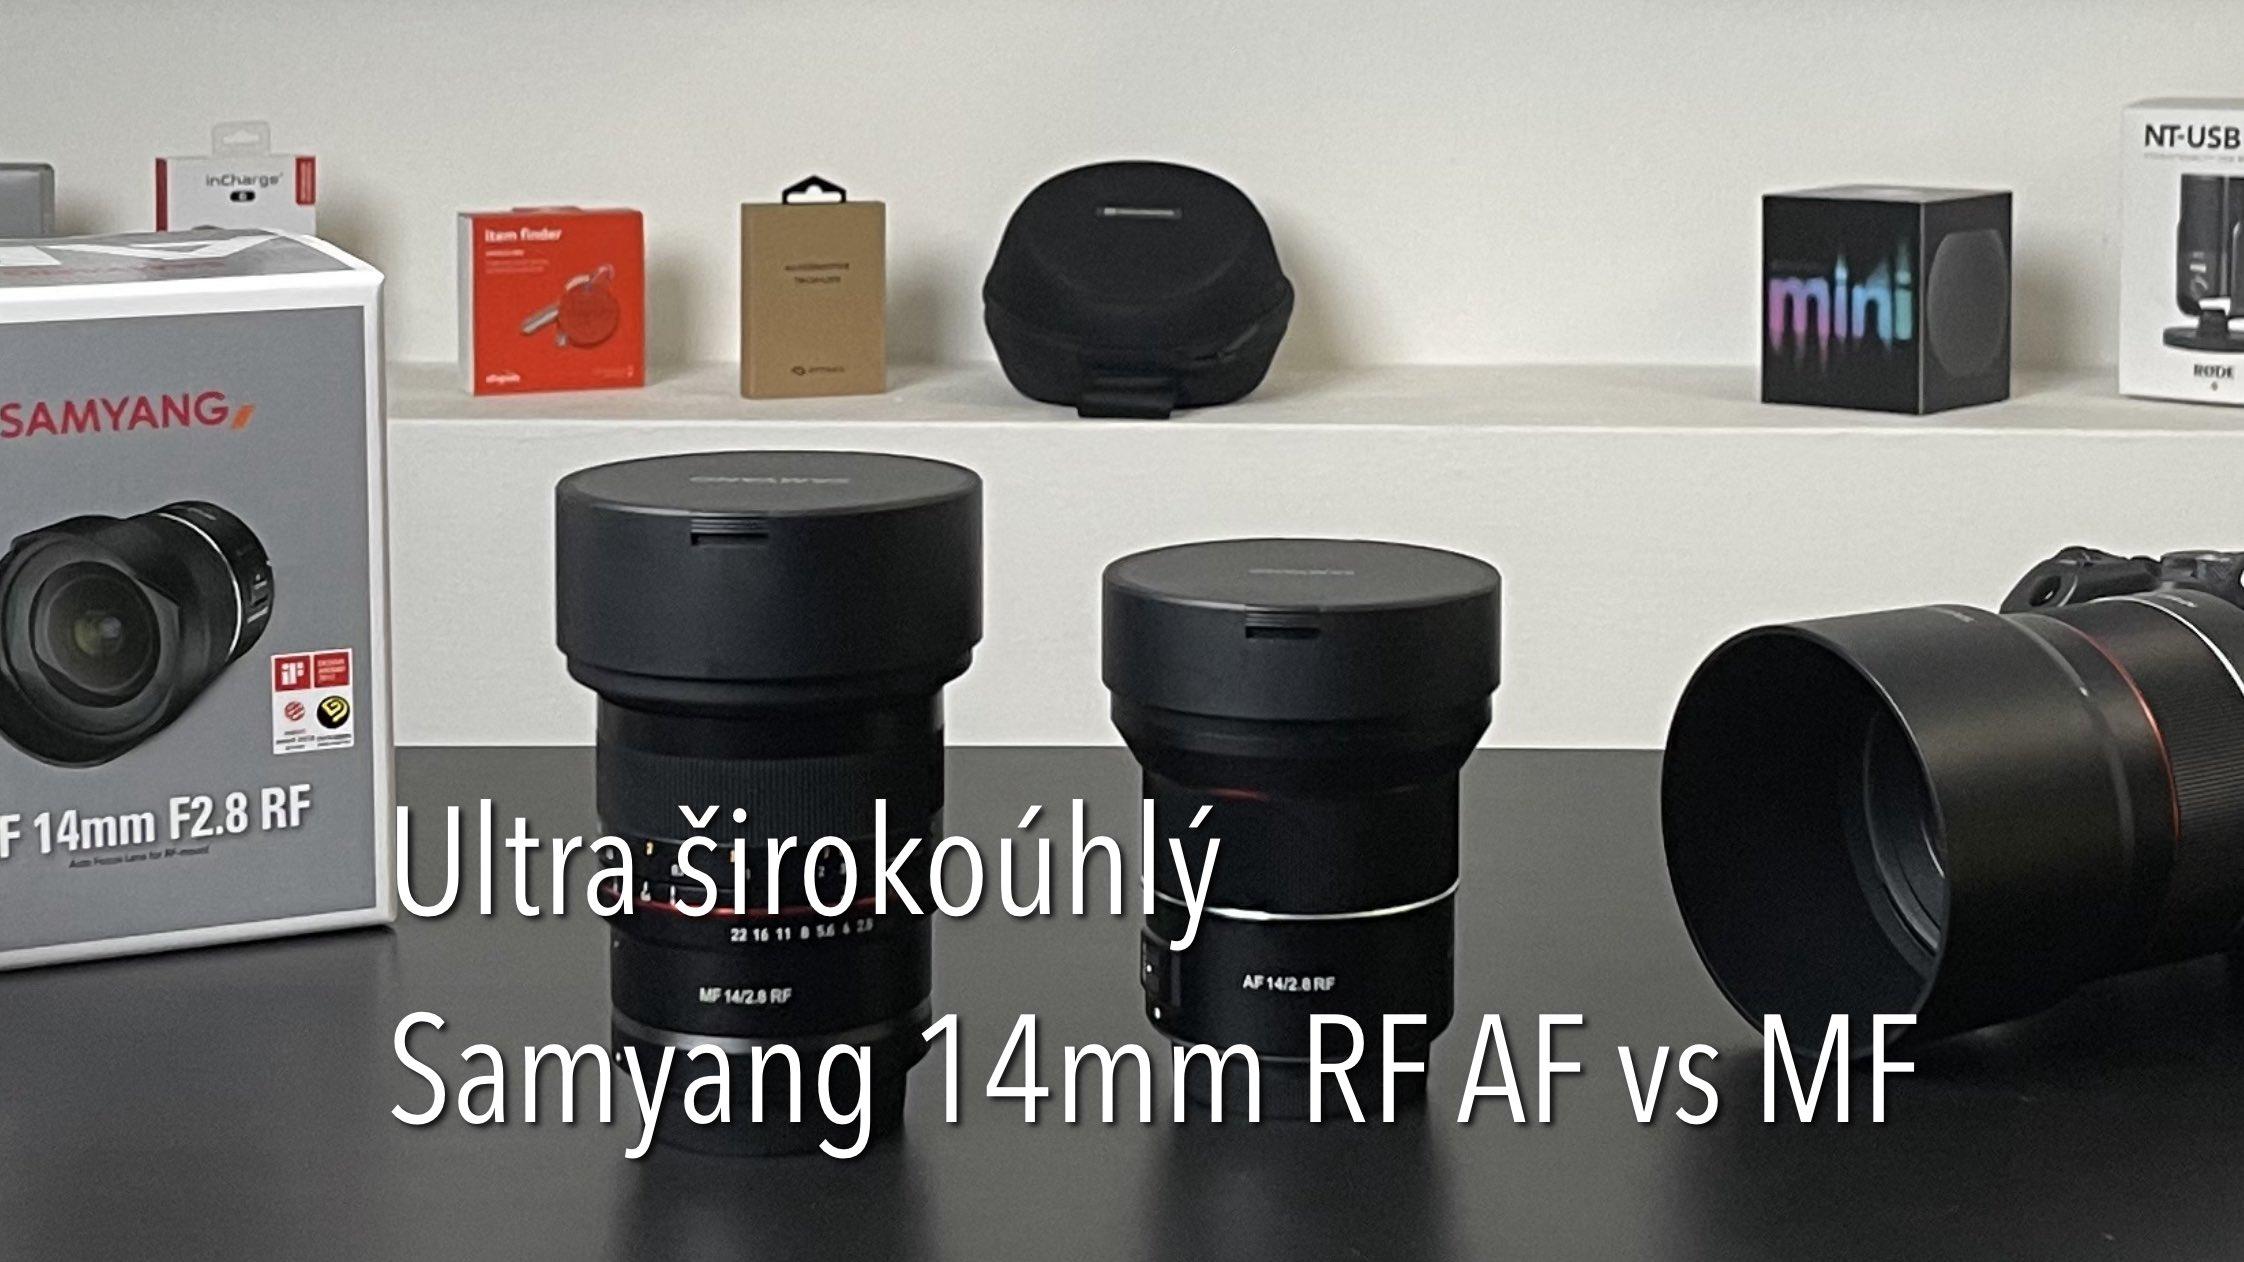 Samyang 14mm f/2.8 RF